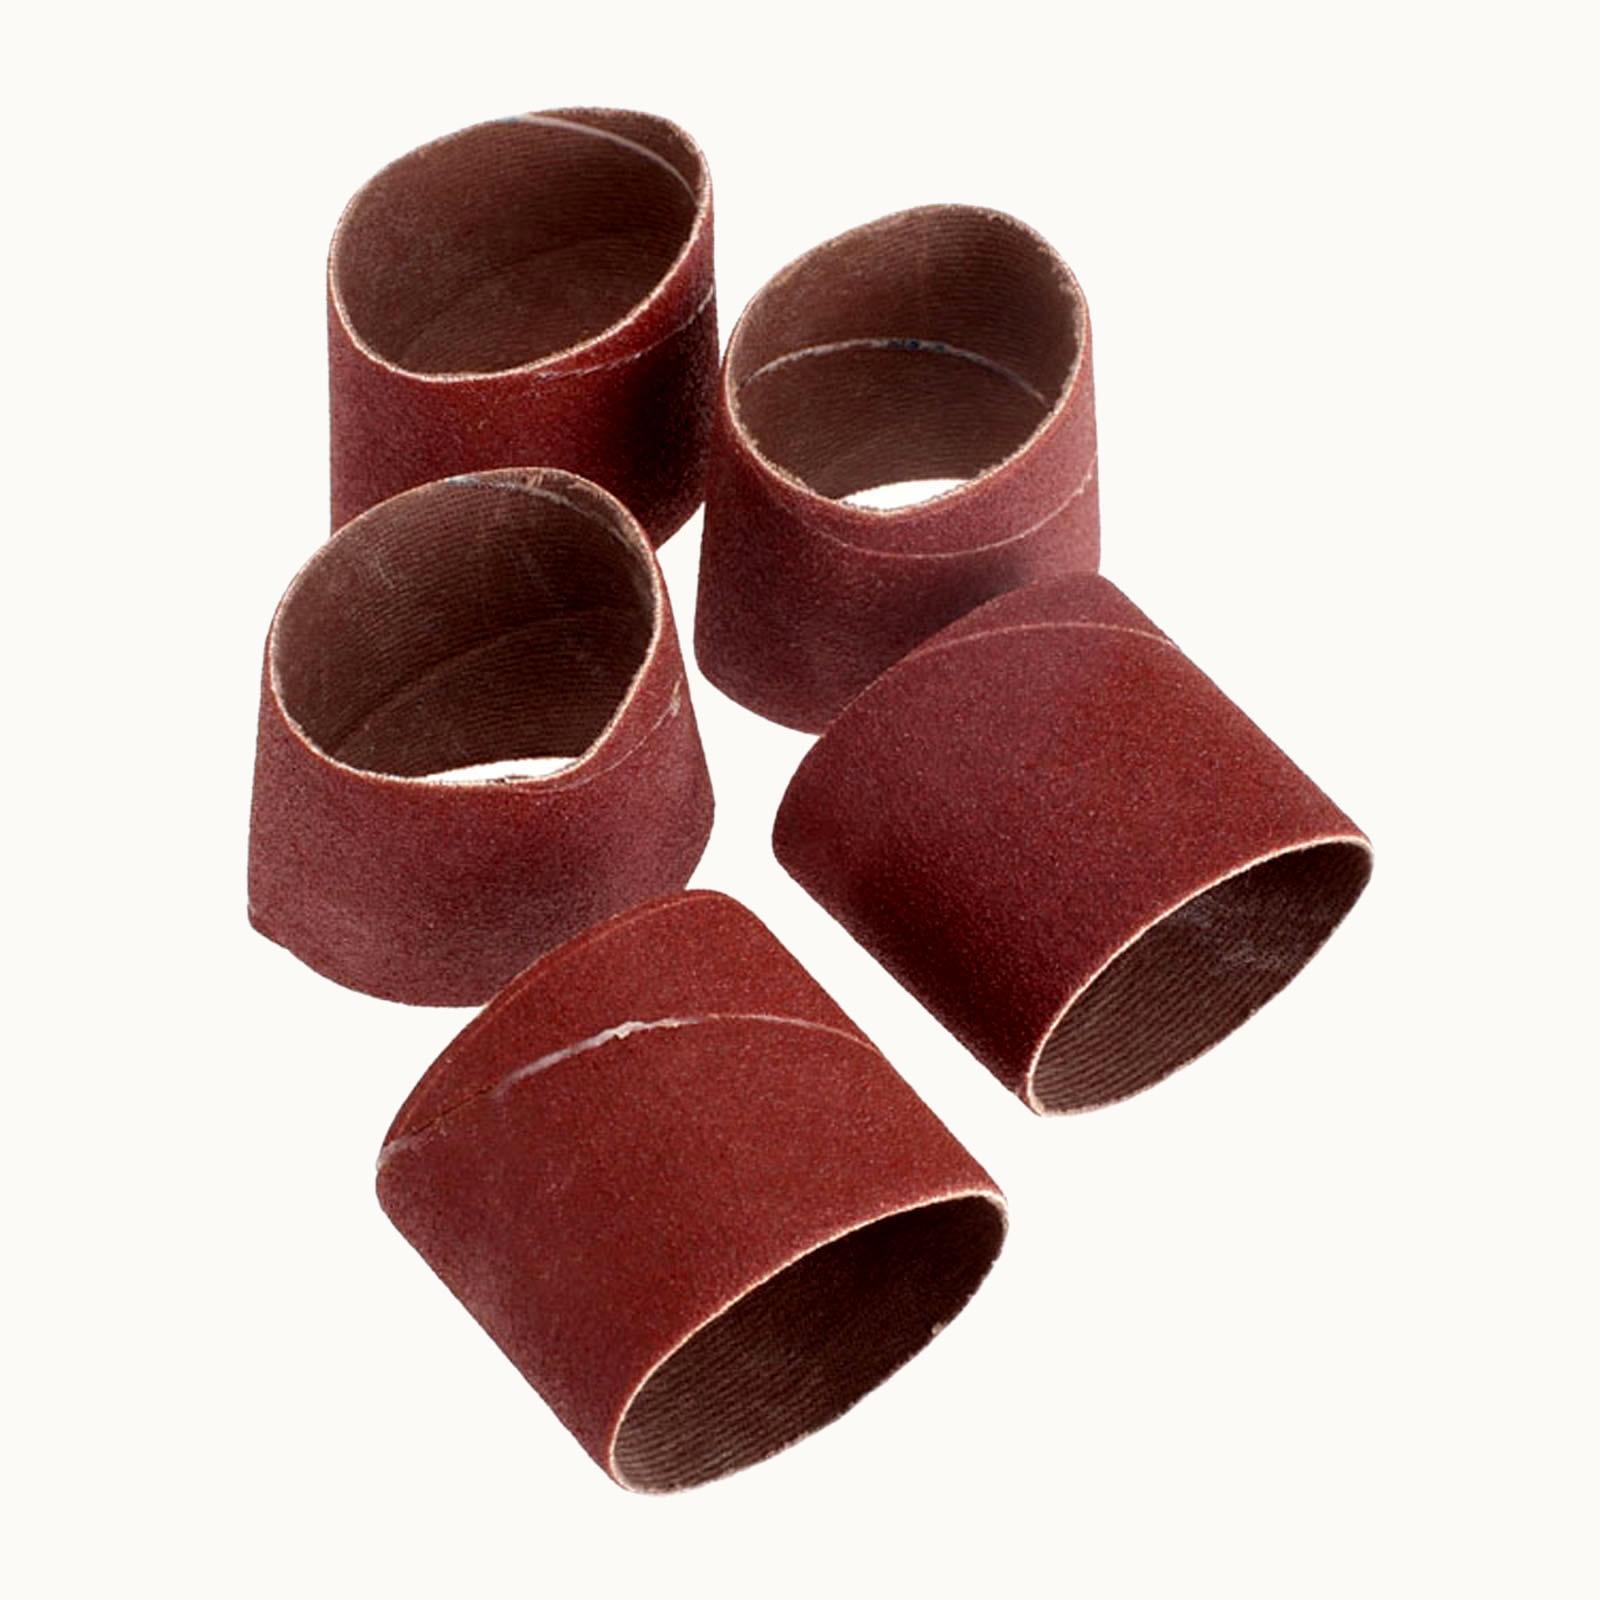 5Pcs Dremel Accessories Sanding Band 80 Grit 38mm Drum Sanding For Dremel Nail Drill Bits File Machine Rotary Tool Abrasive Tool